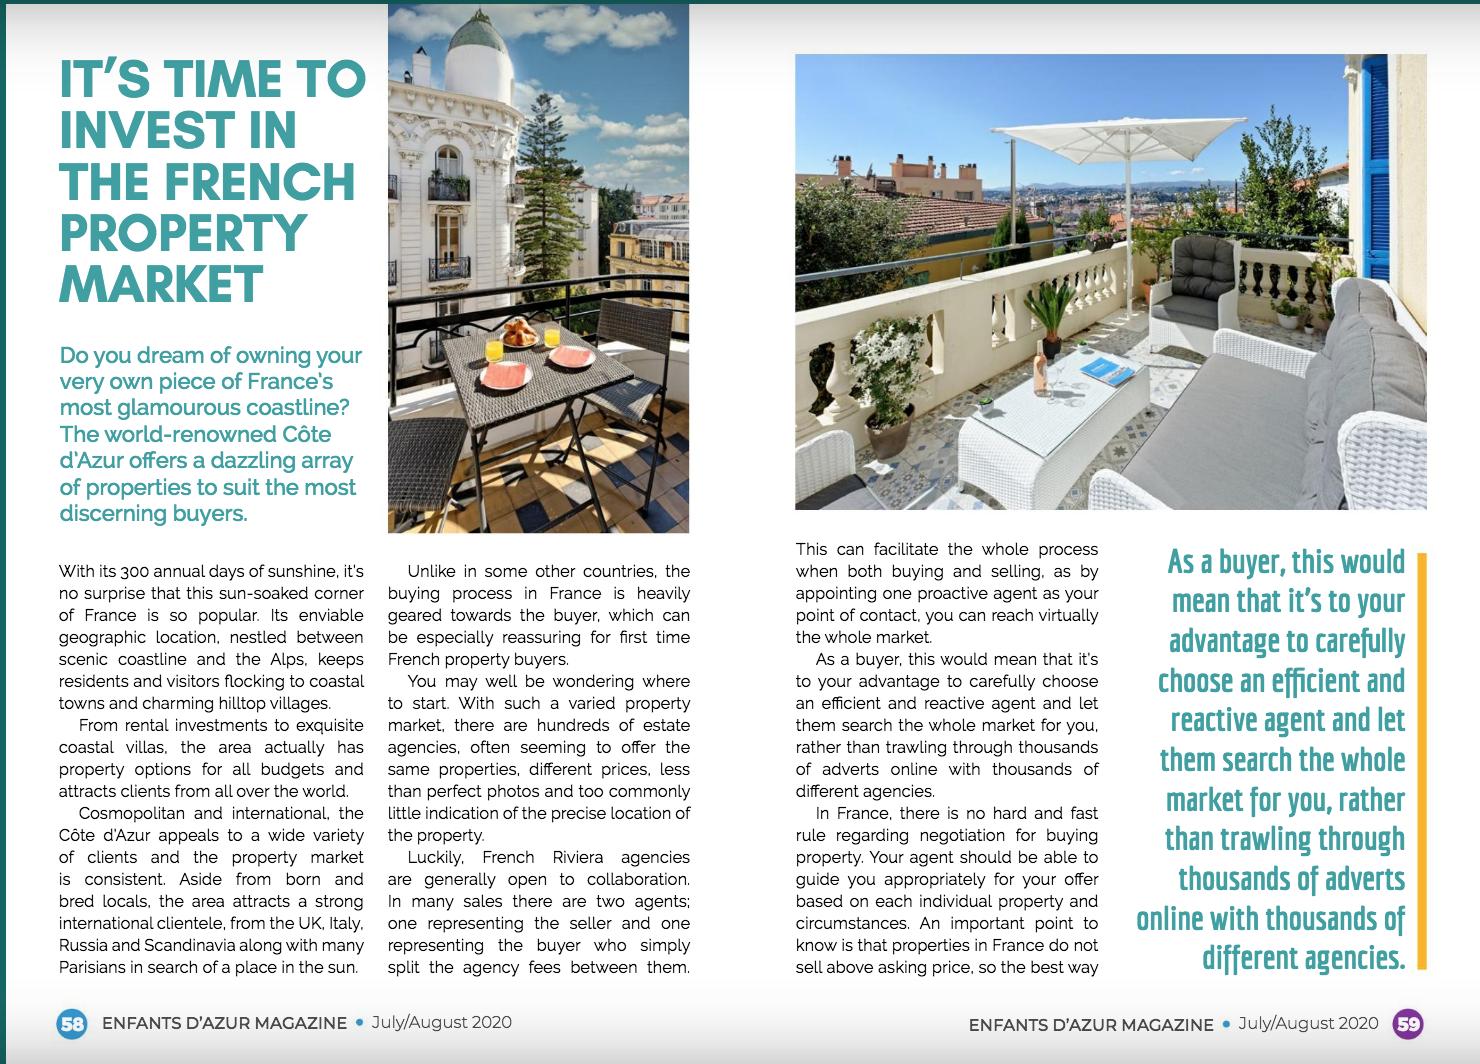 Abitan-Immobilier-enfant-d-azur-magazine-juillet-aout-2020-real-estate-invest-property-french-riviera